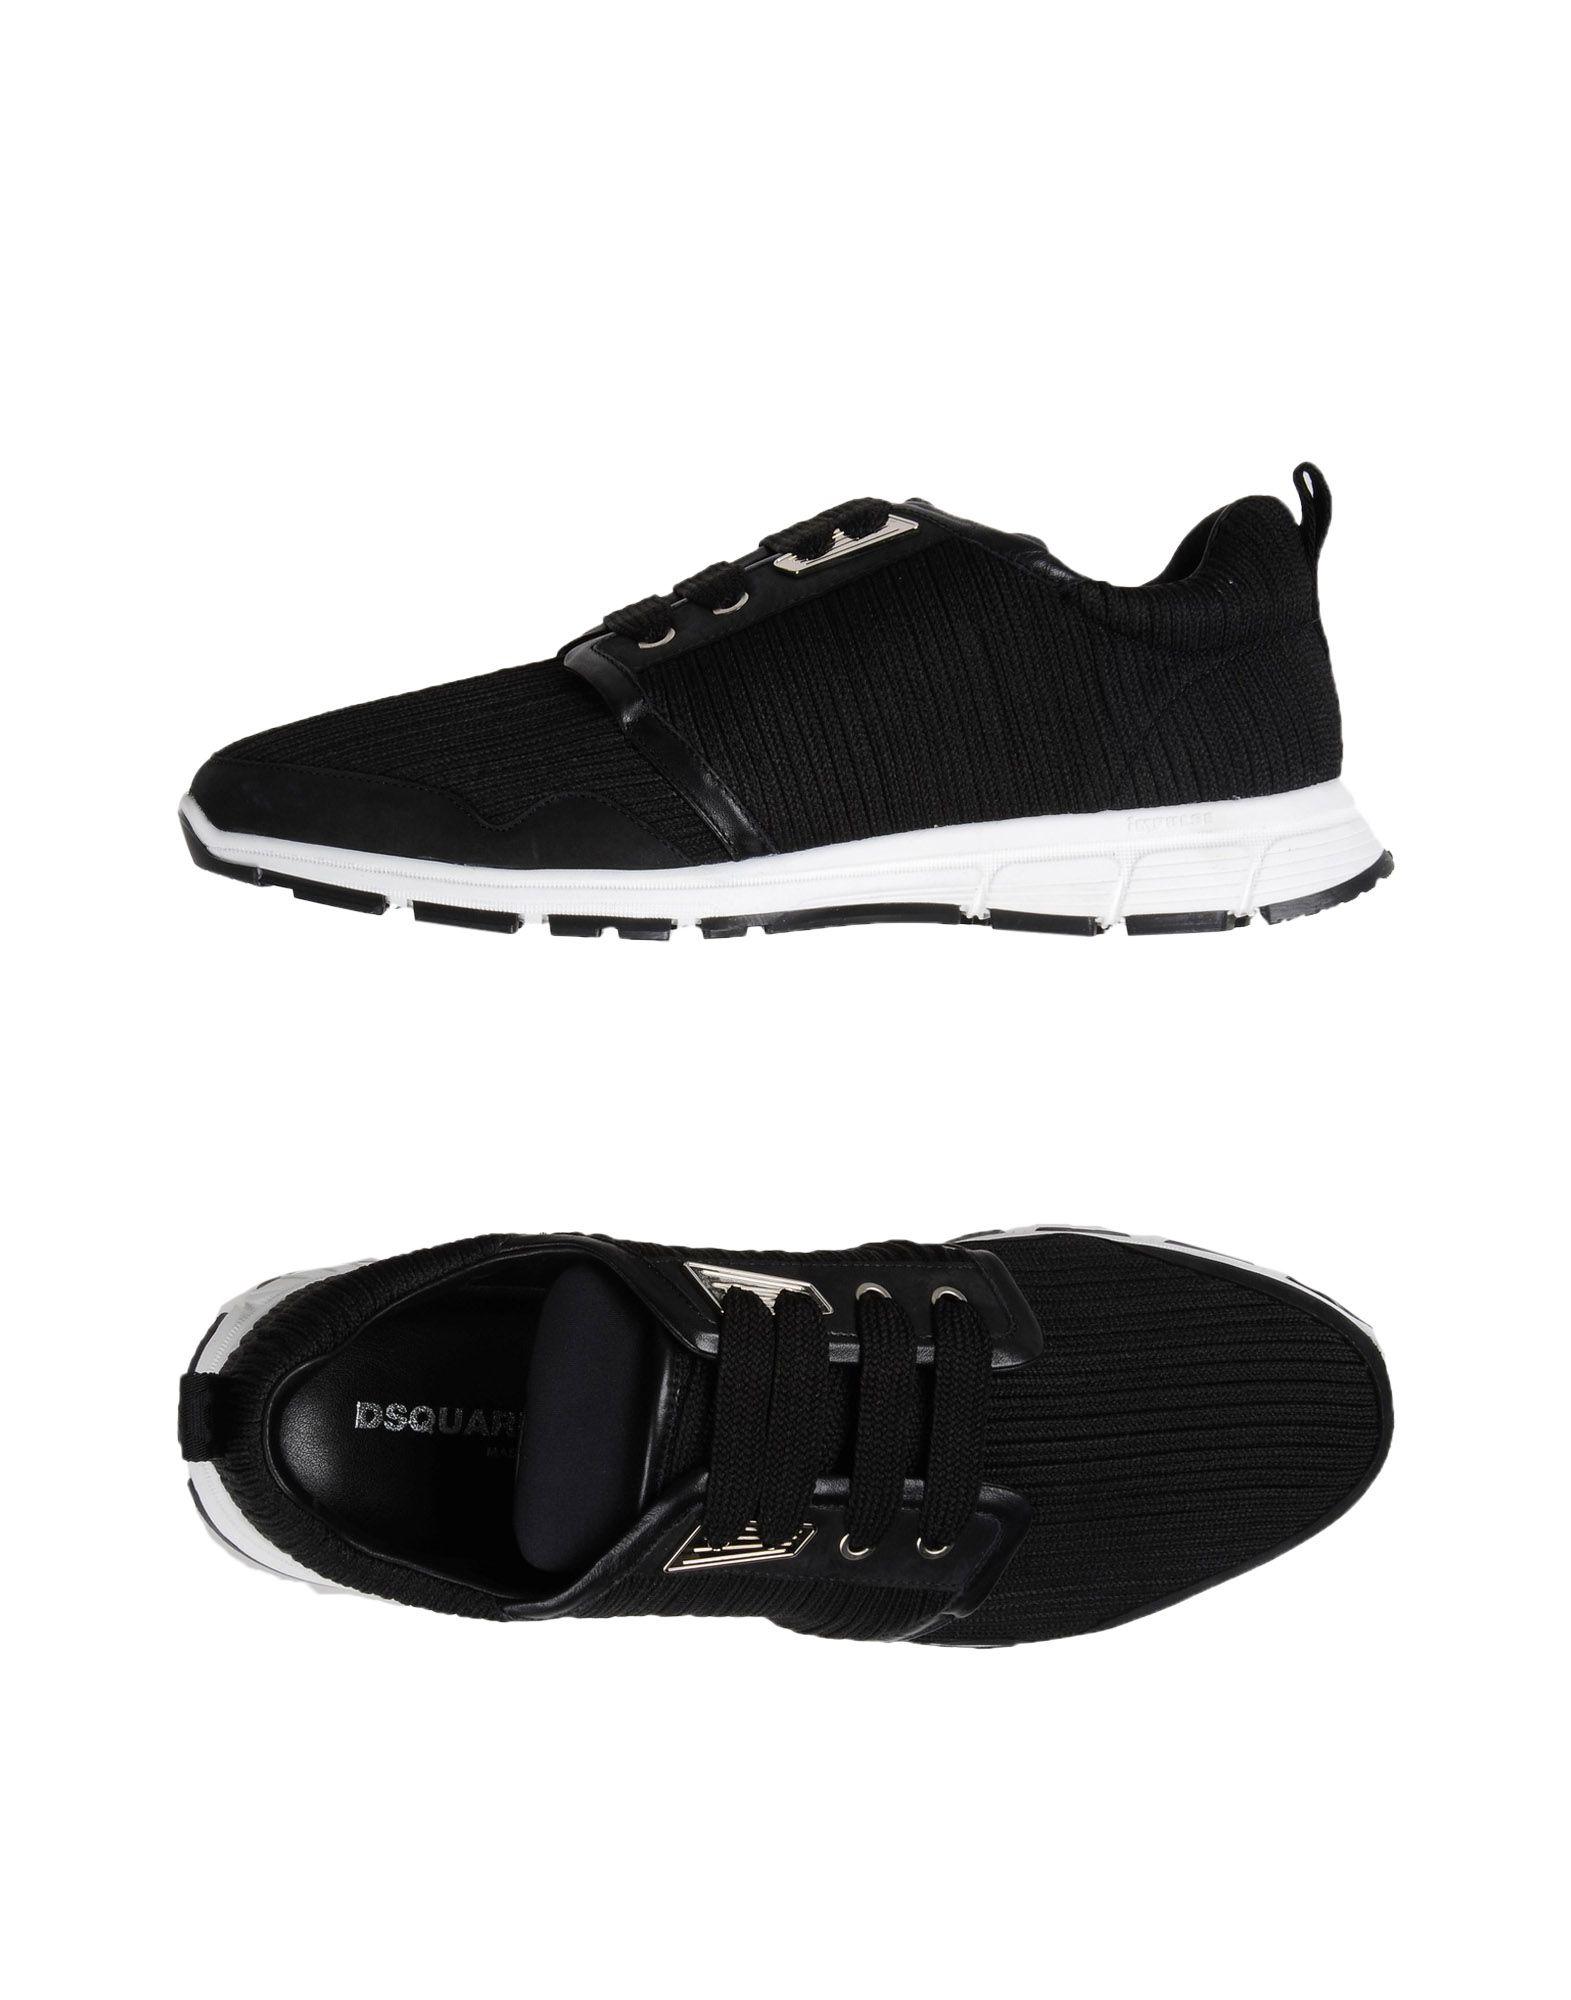 Dsquared2 Sneakers Herren  11173153HU Gute Qualität beliebte Schuhe